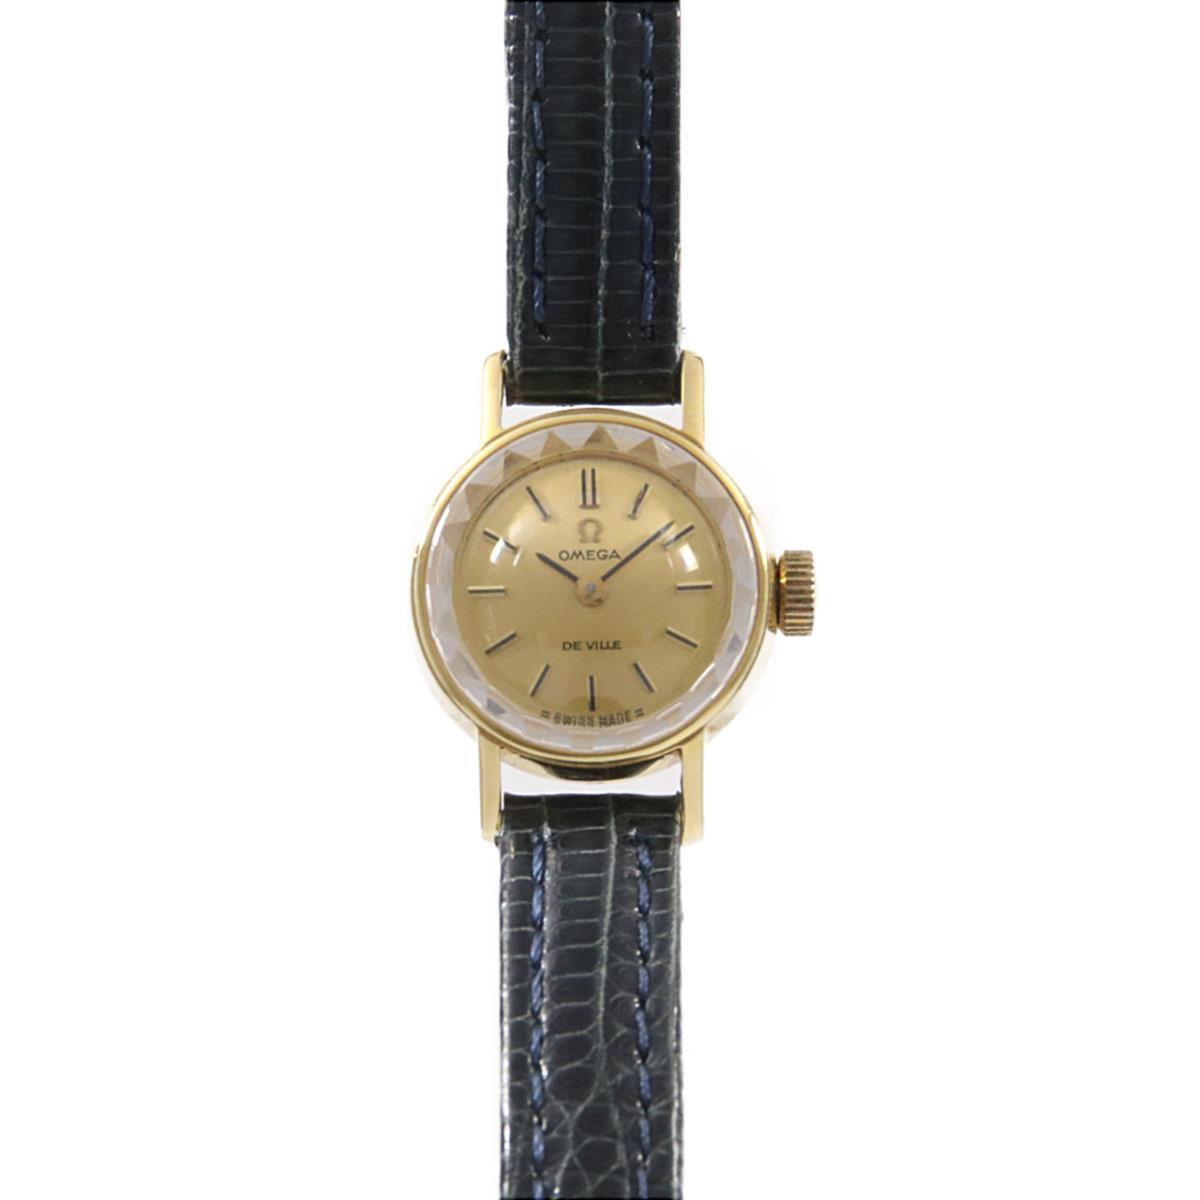 OMEGAのアンティーク腕時計